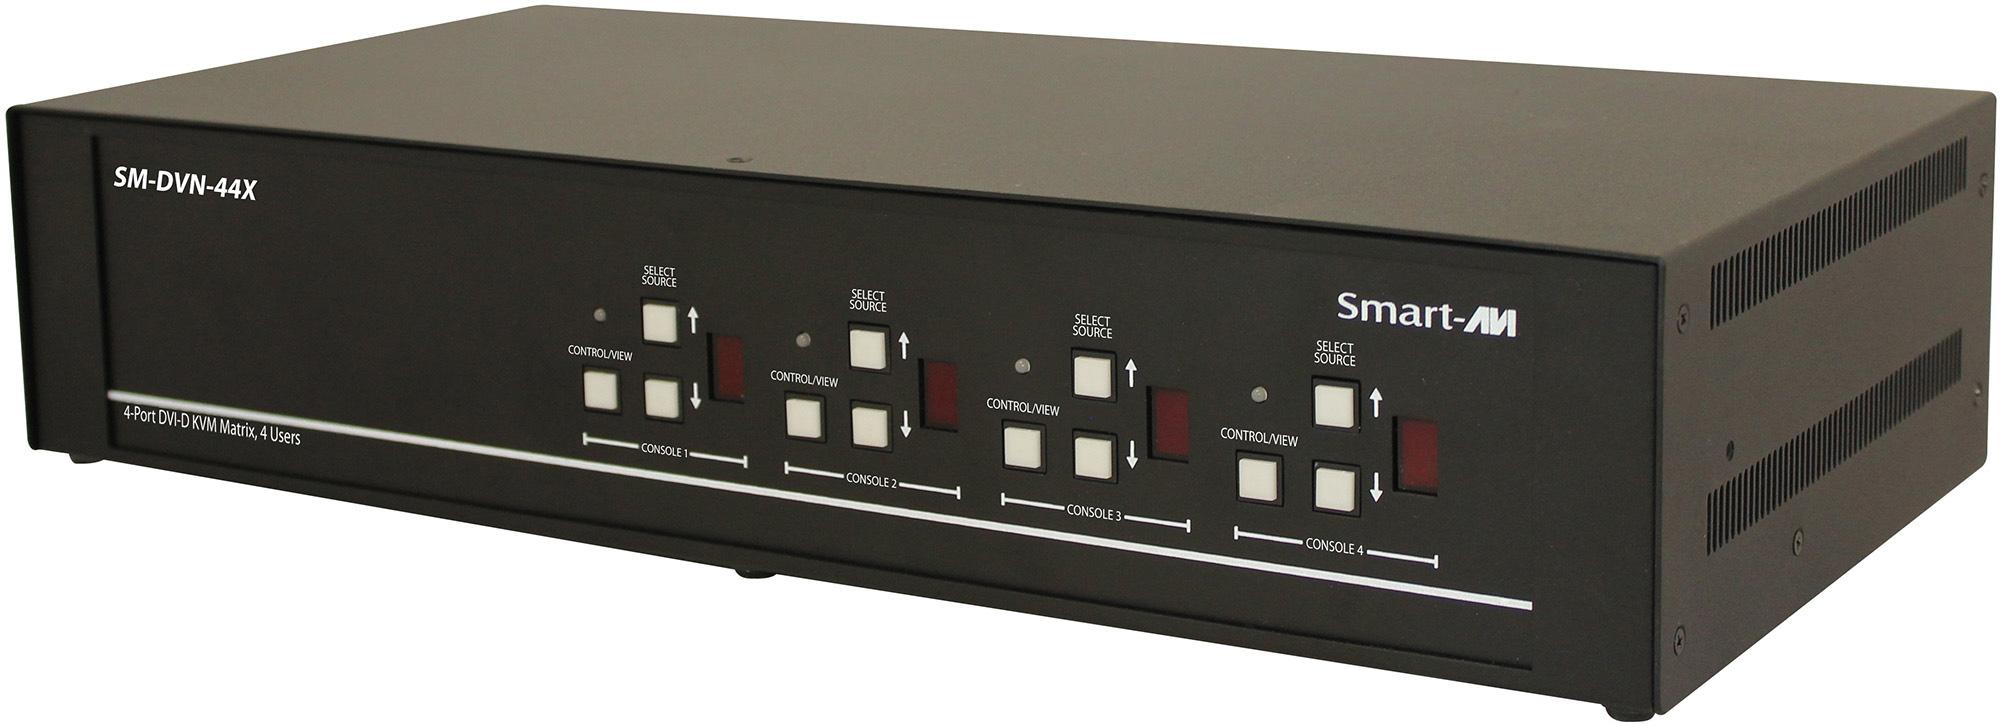 Smart AVI SM-DVN-44X DVI-D Matrix KVM Switch with Audio and USB 2.0 Support (4 Users) - 4 Port SAVI-SM-DVN-44X